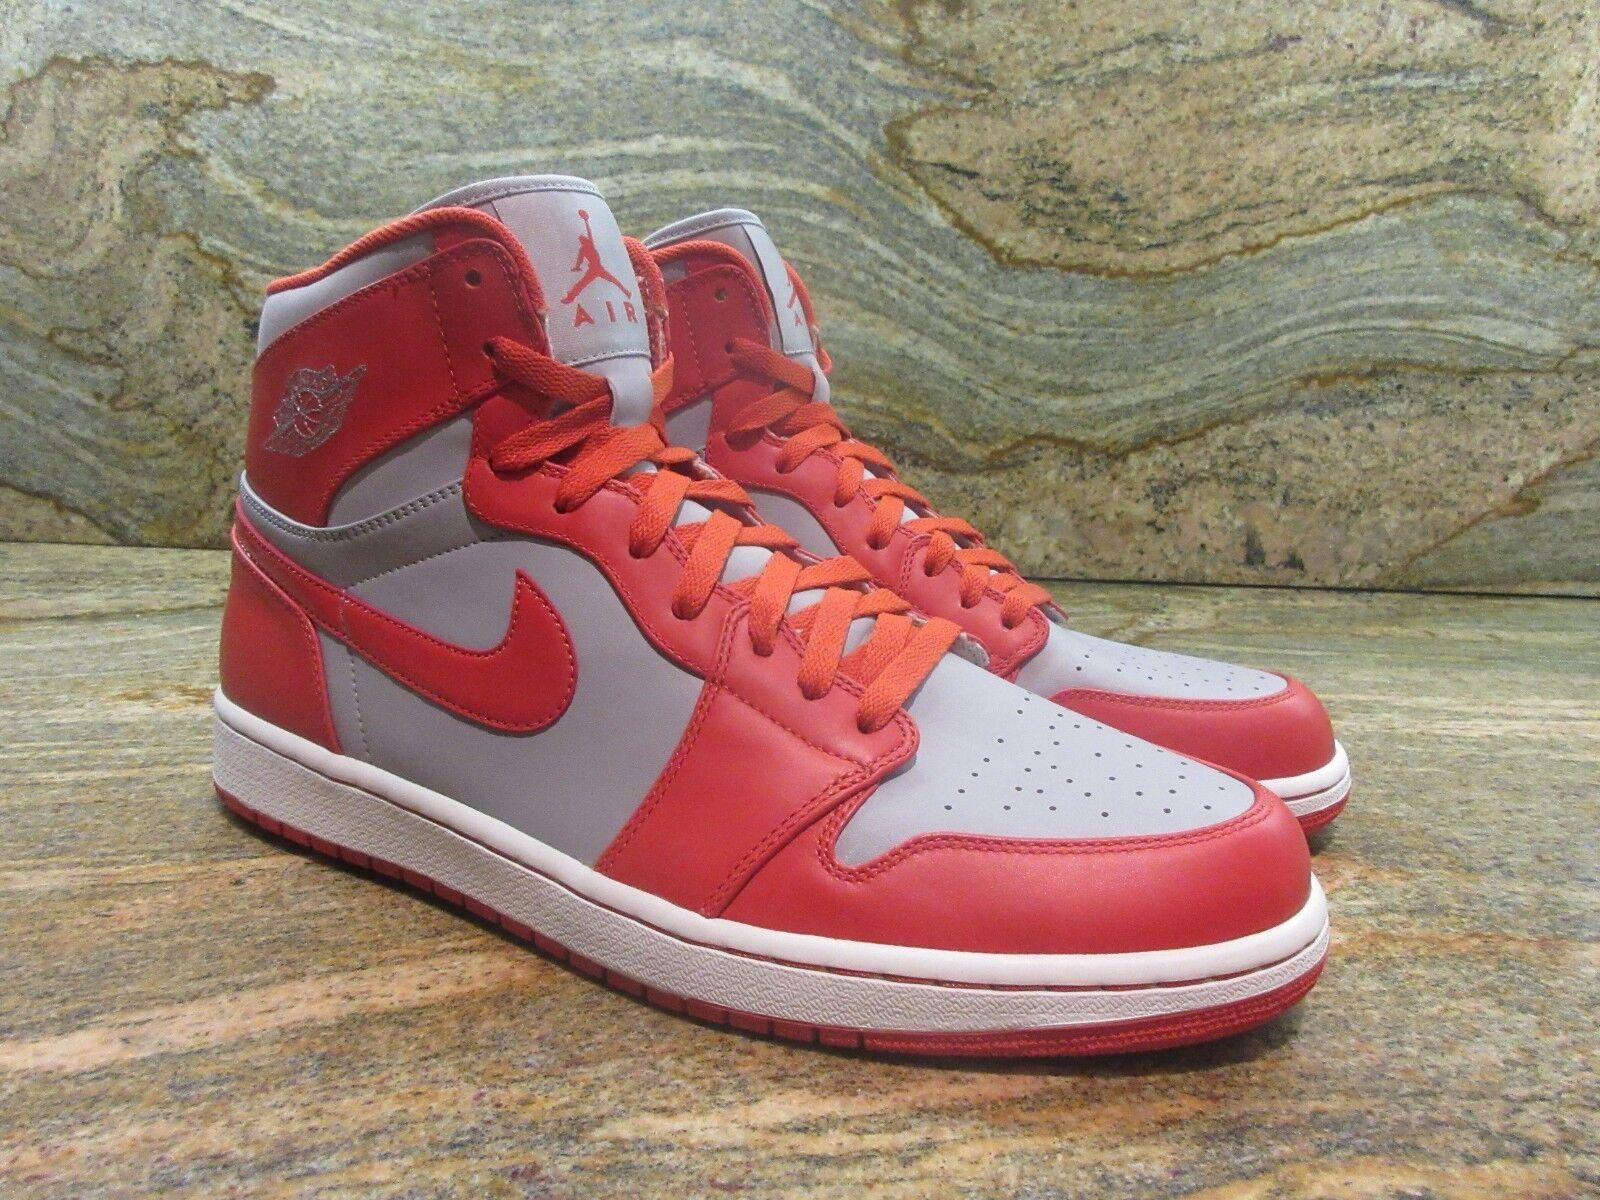 UNRELEASED Nike Air Jordan 1 Retro High Promo Sample SZ 13 Spice orange Grey PE